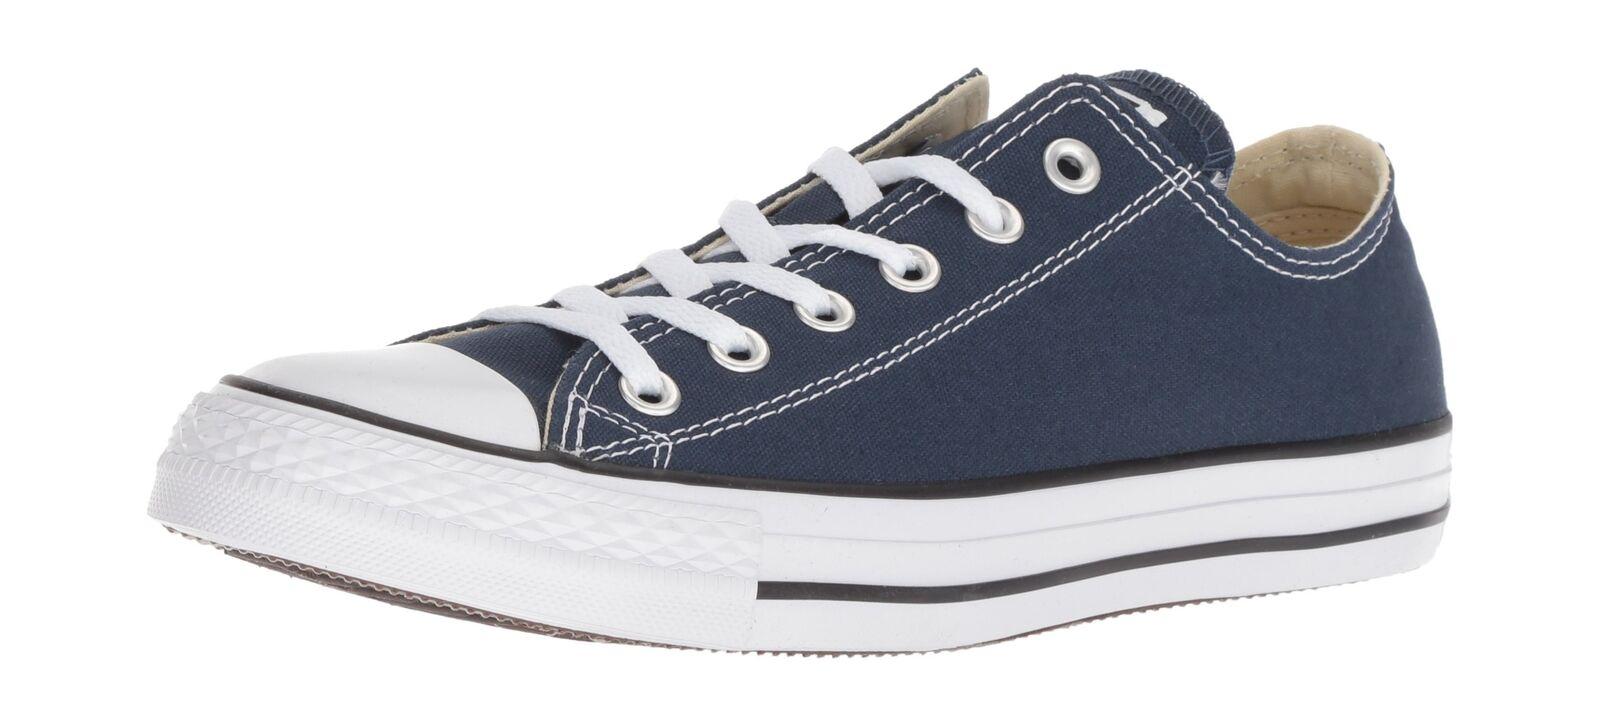 Zapatos promocionales para hombres y mujeres Converse Womens Chuck Taylor All Star Core Ox Sneakers Blue (Navy) (Navy)